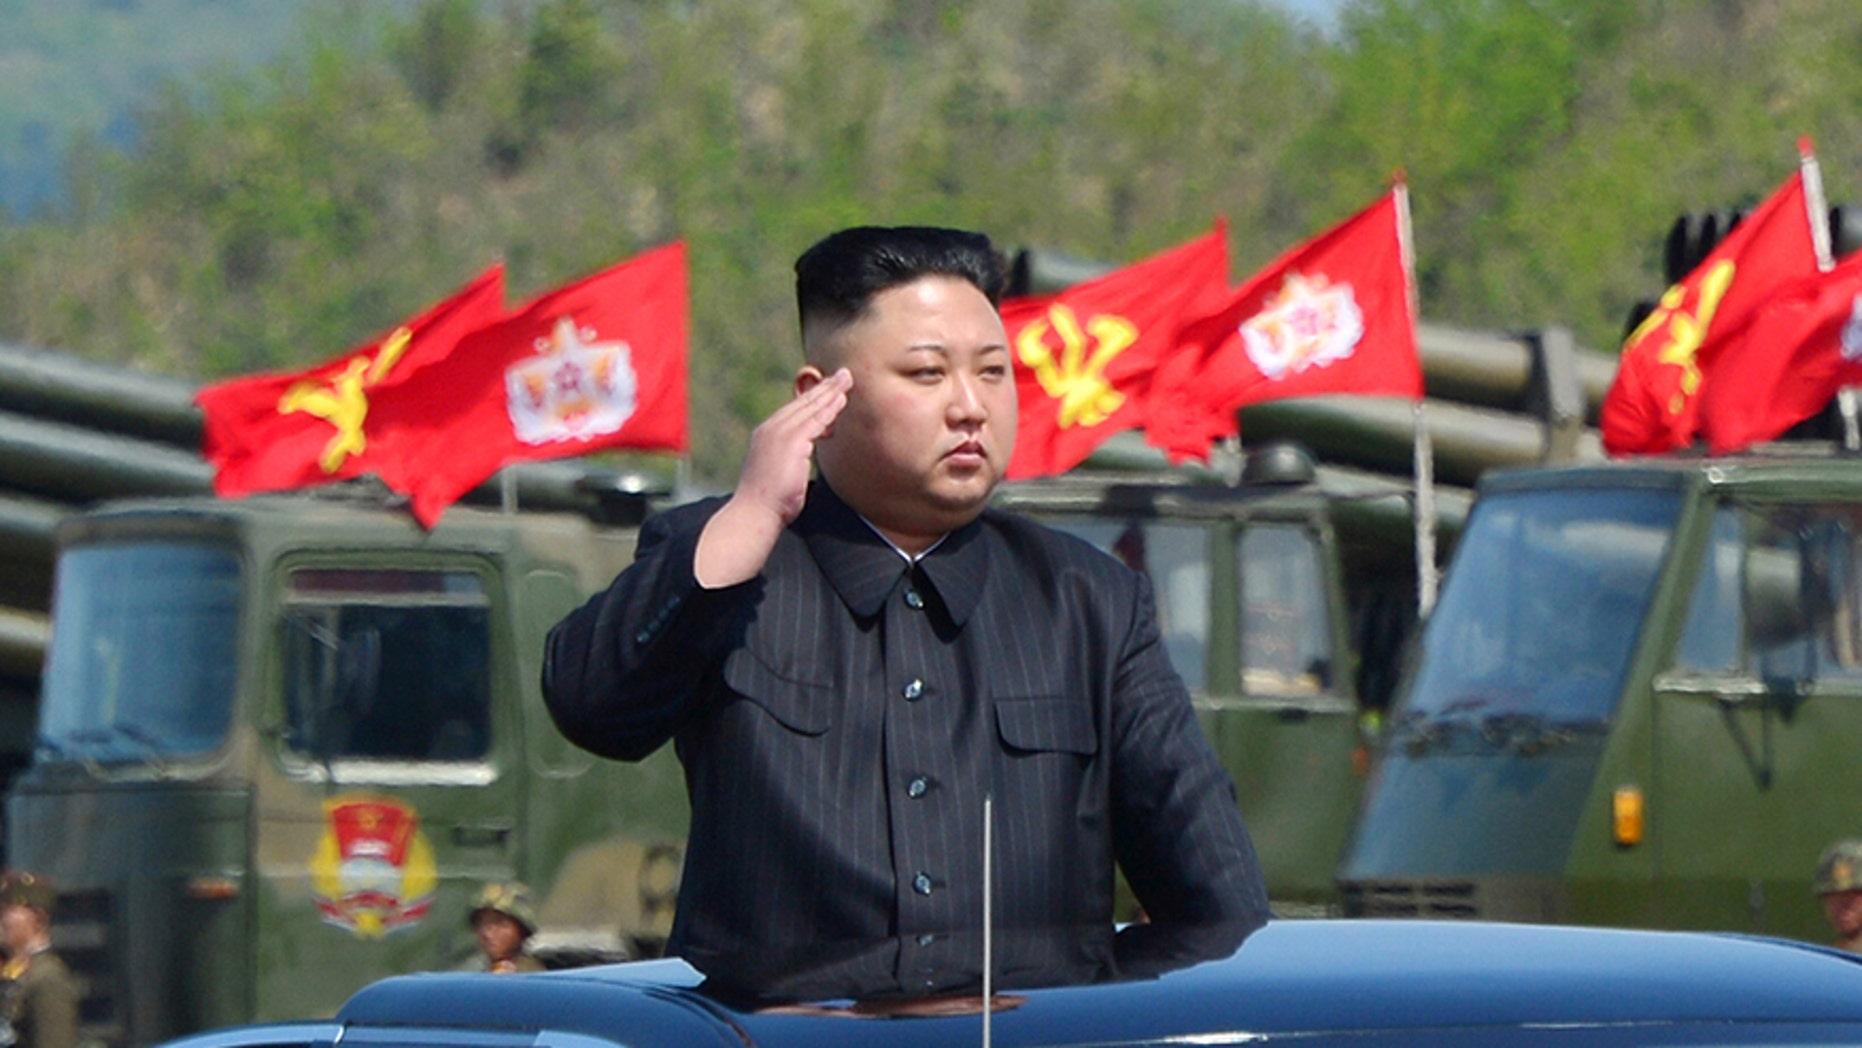 North Korea's leader Kim Jong Un watches a military drill, April 26, 2017.